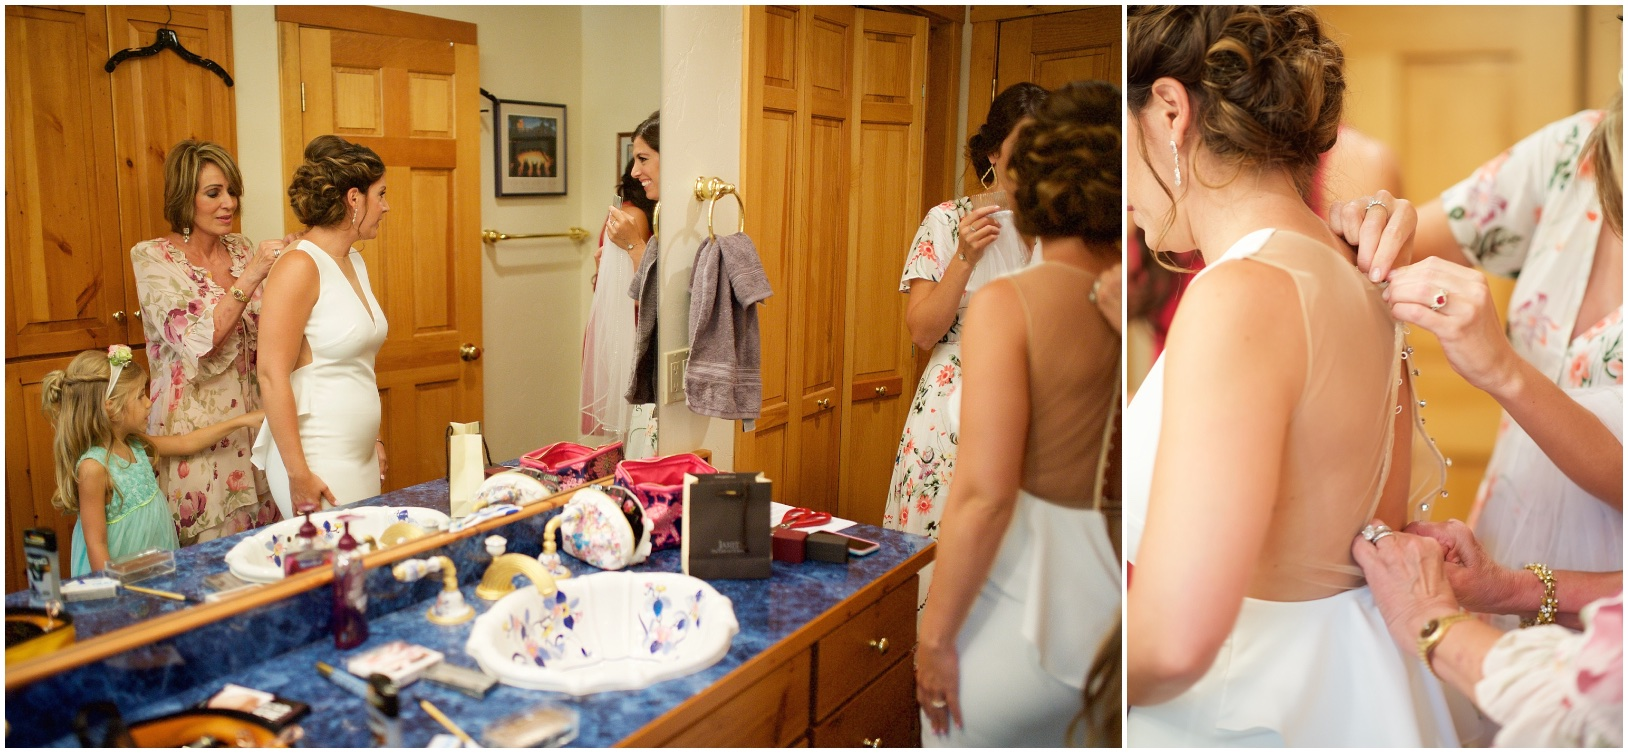 lindseyjane_wedding003.jpg